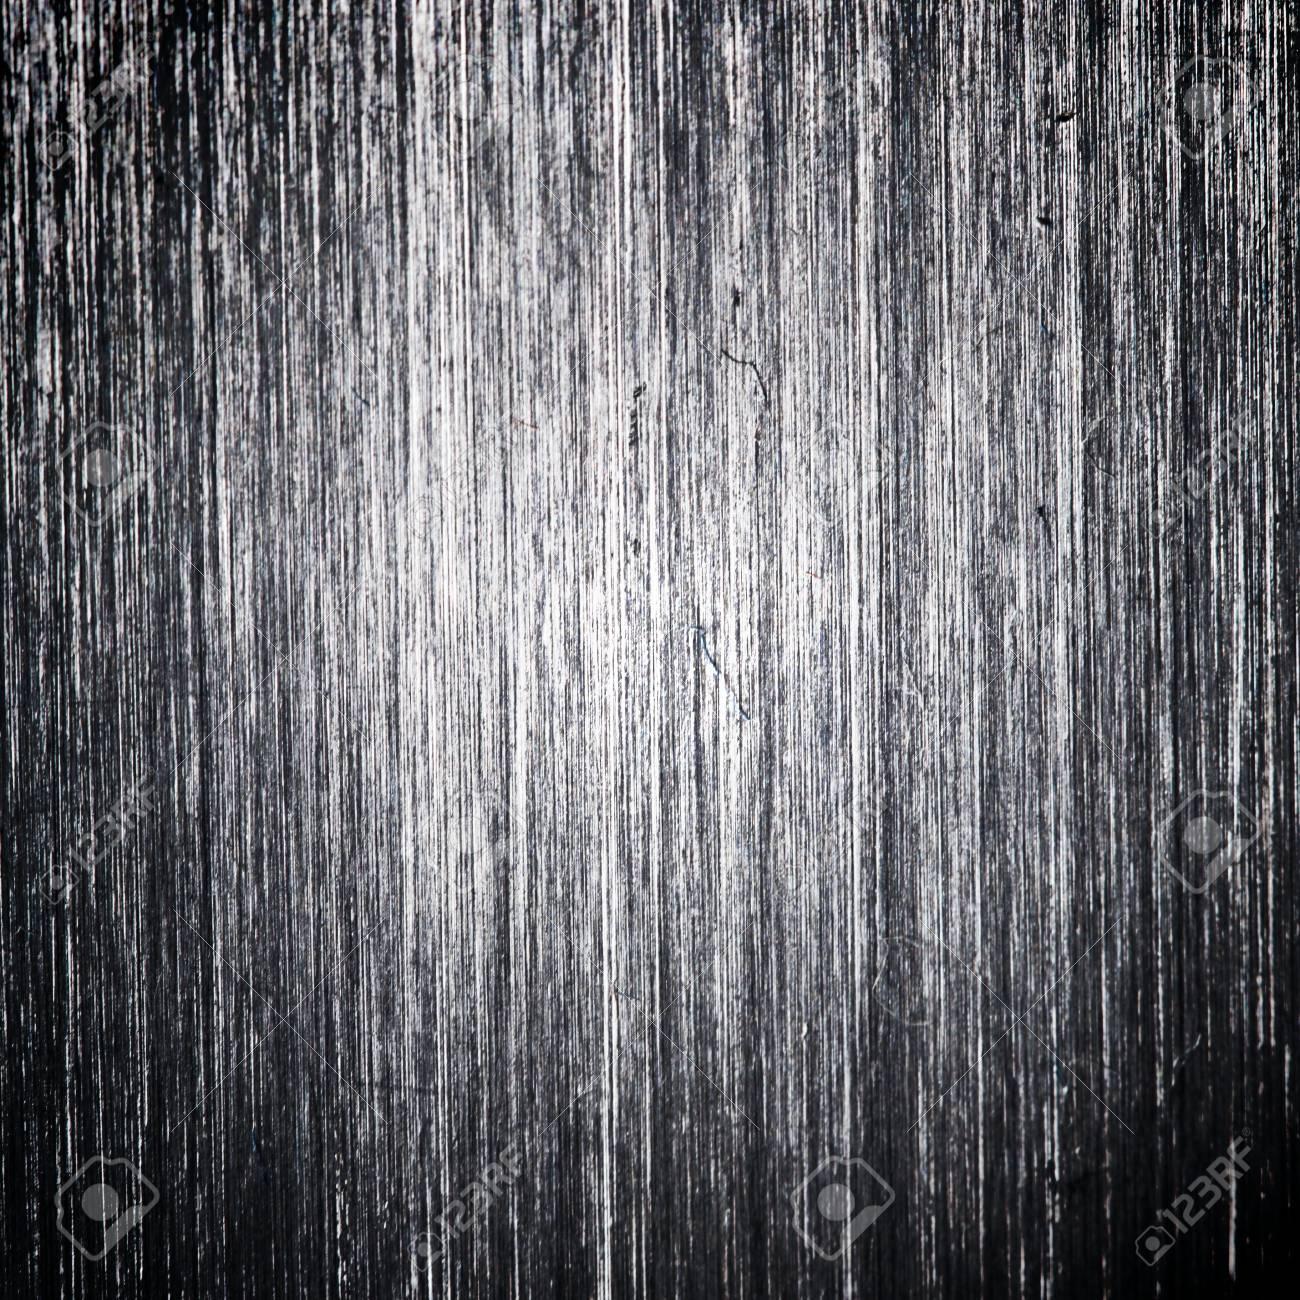 aluminium metal background close up Stock Photo - 9122263